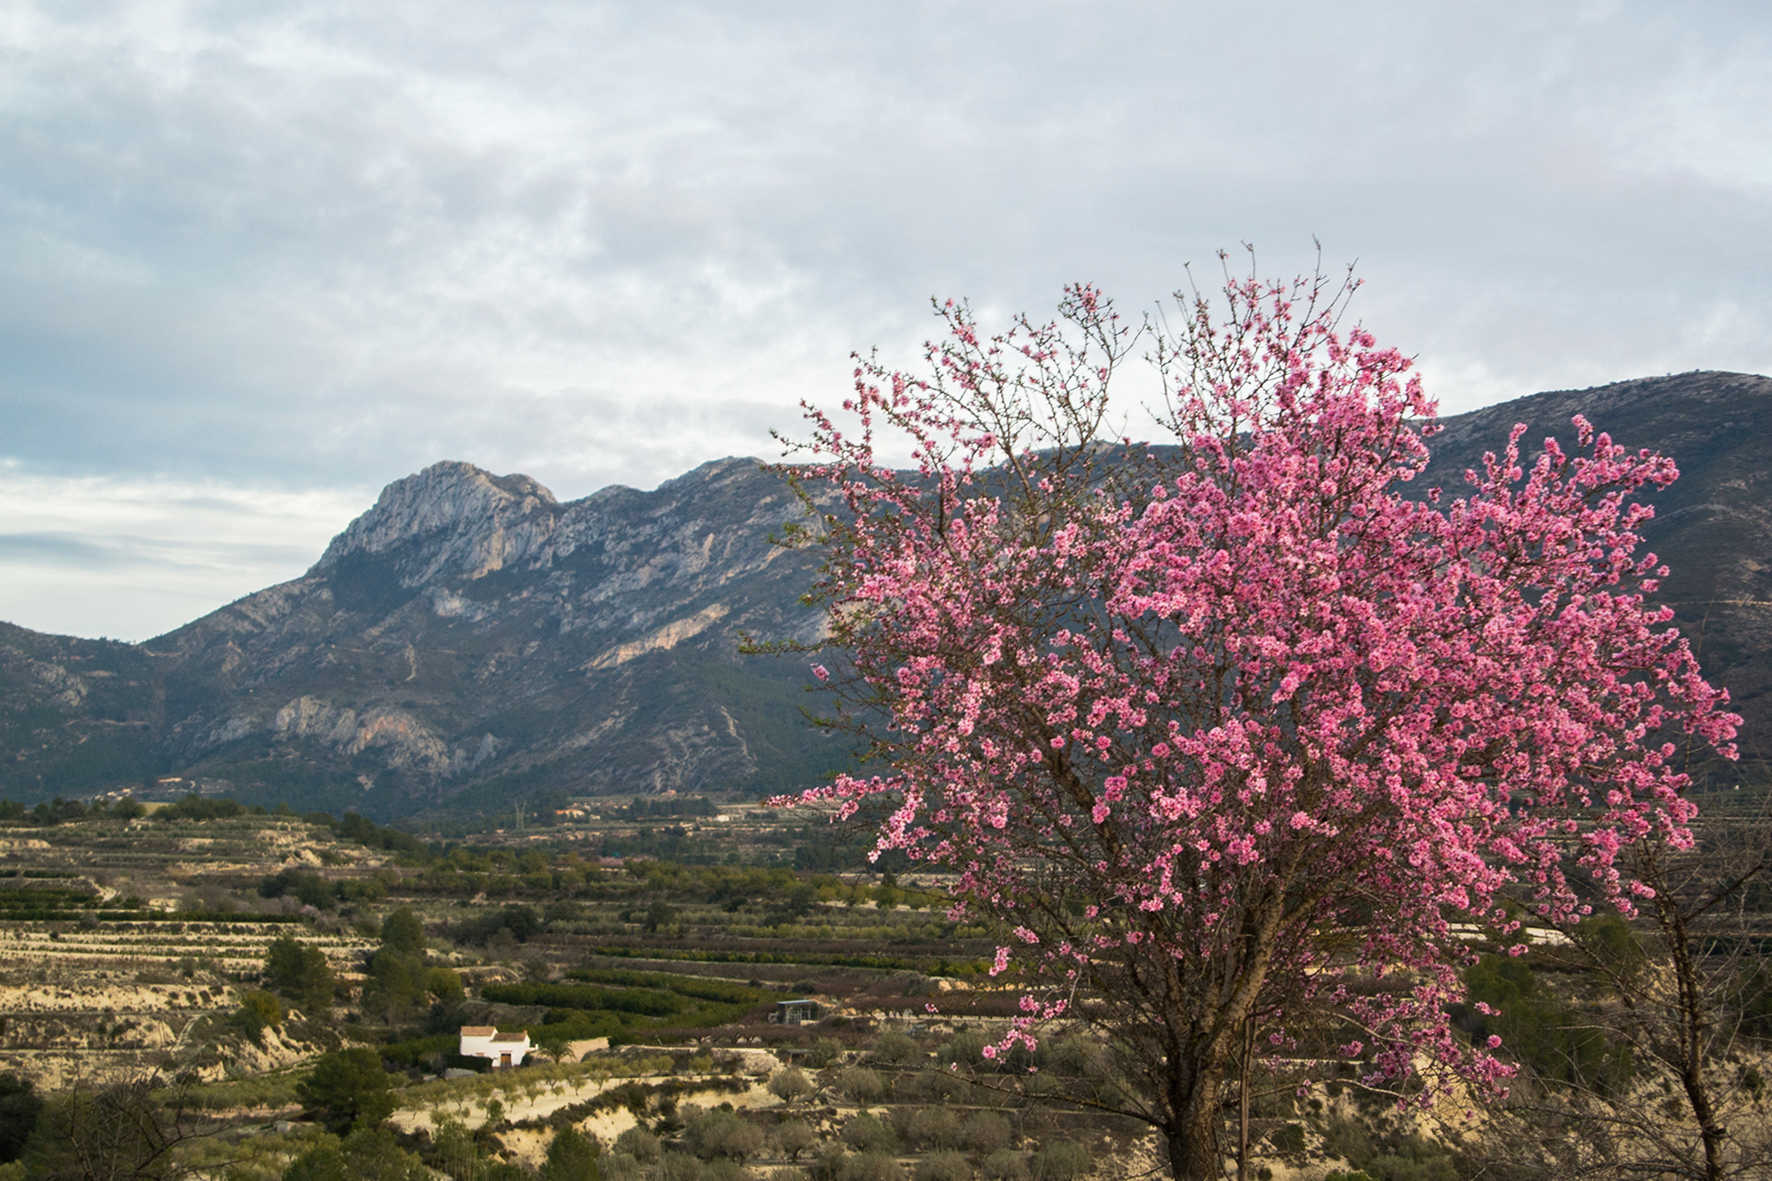 Solana de Benicadell protected landscape